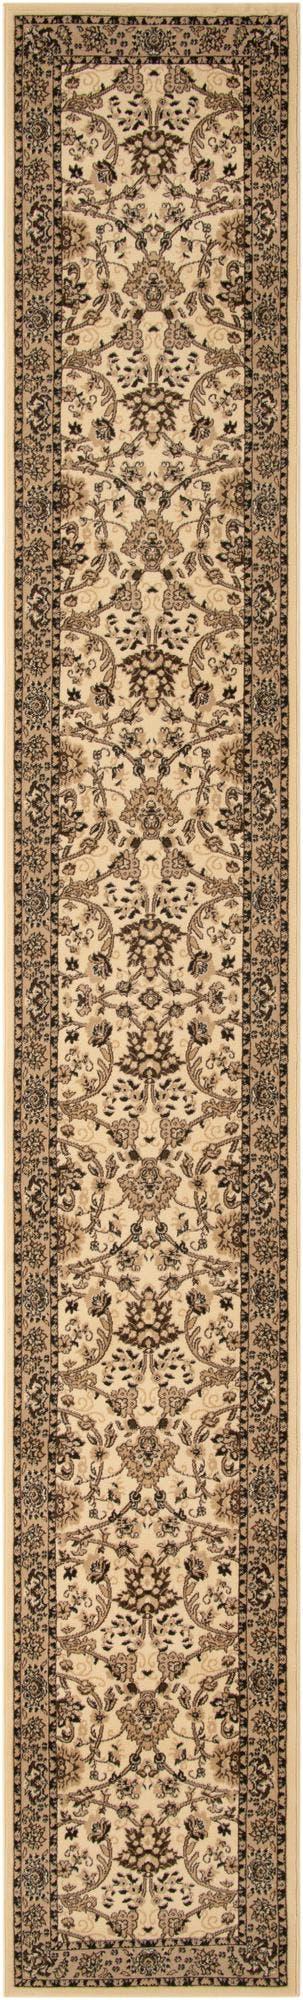 3' x 19' 8 Kashan Design Runner Rug main image